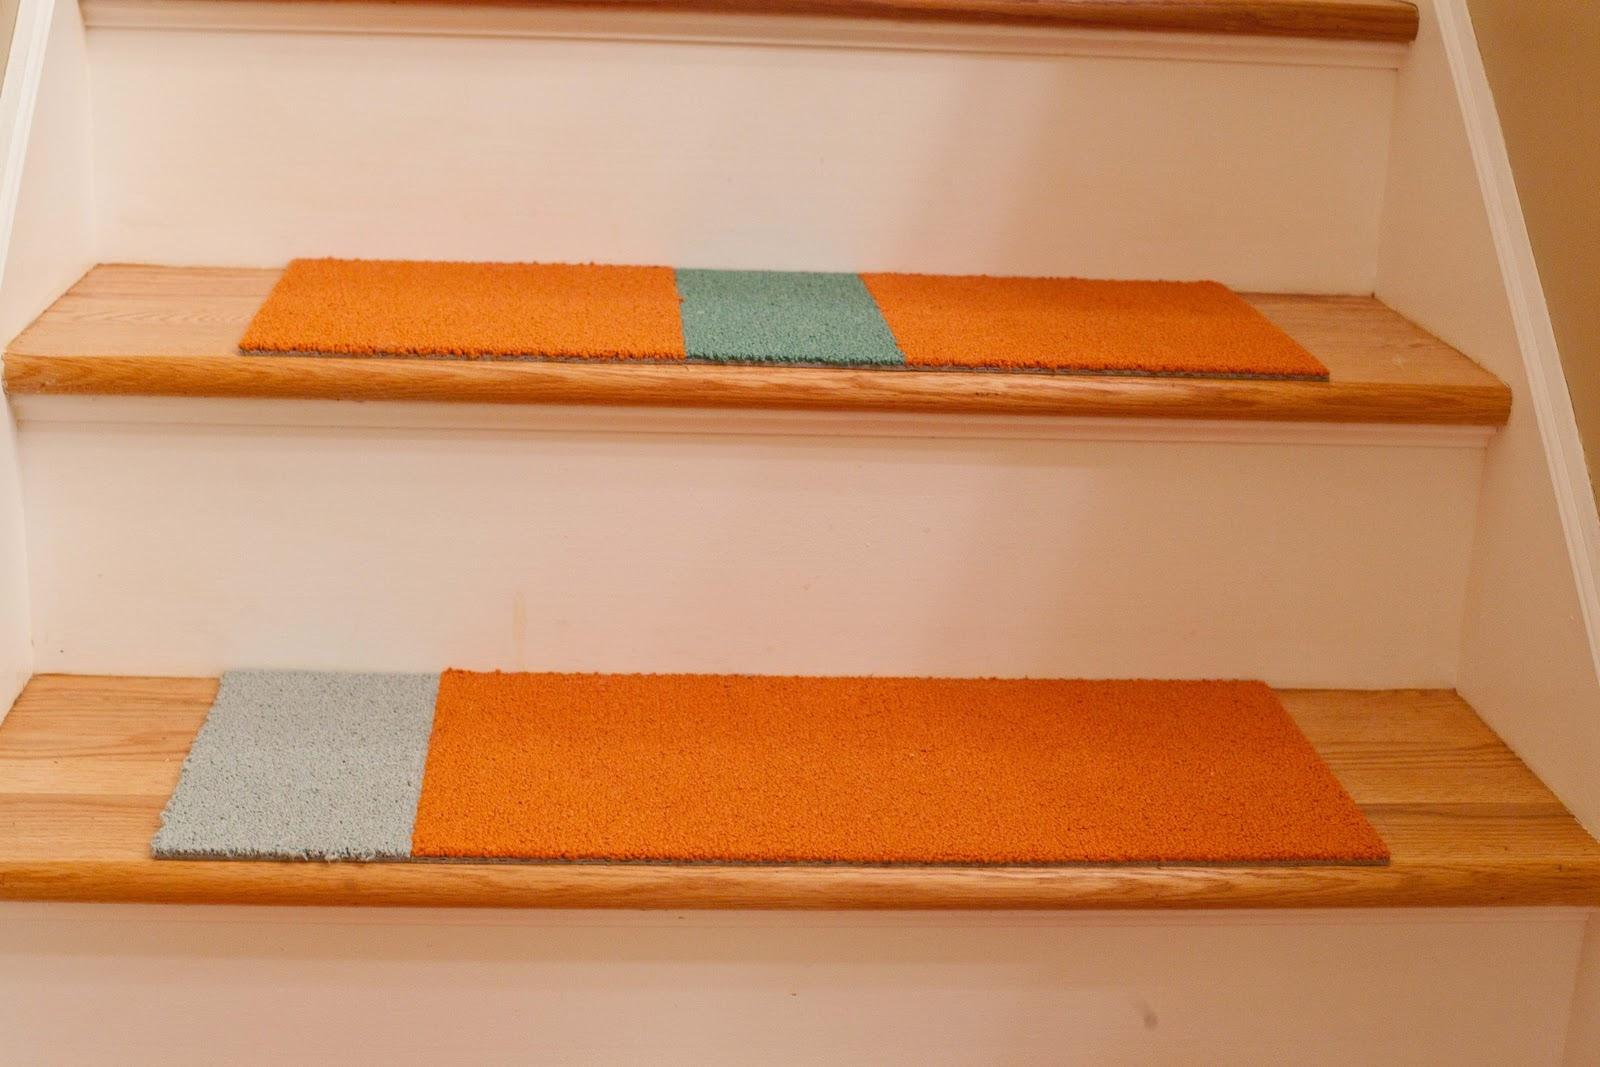 20 Best Ideas of Stair Tread Carpet Tiles